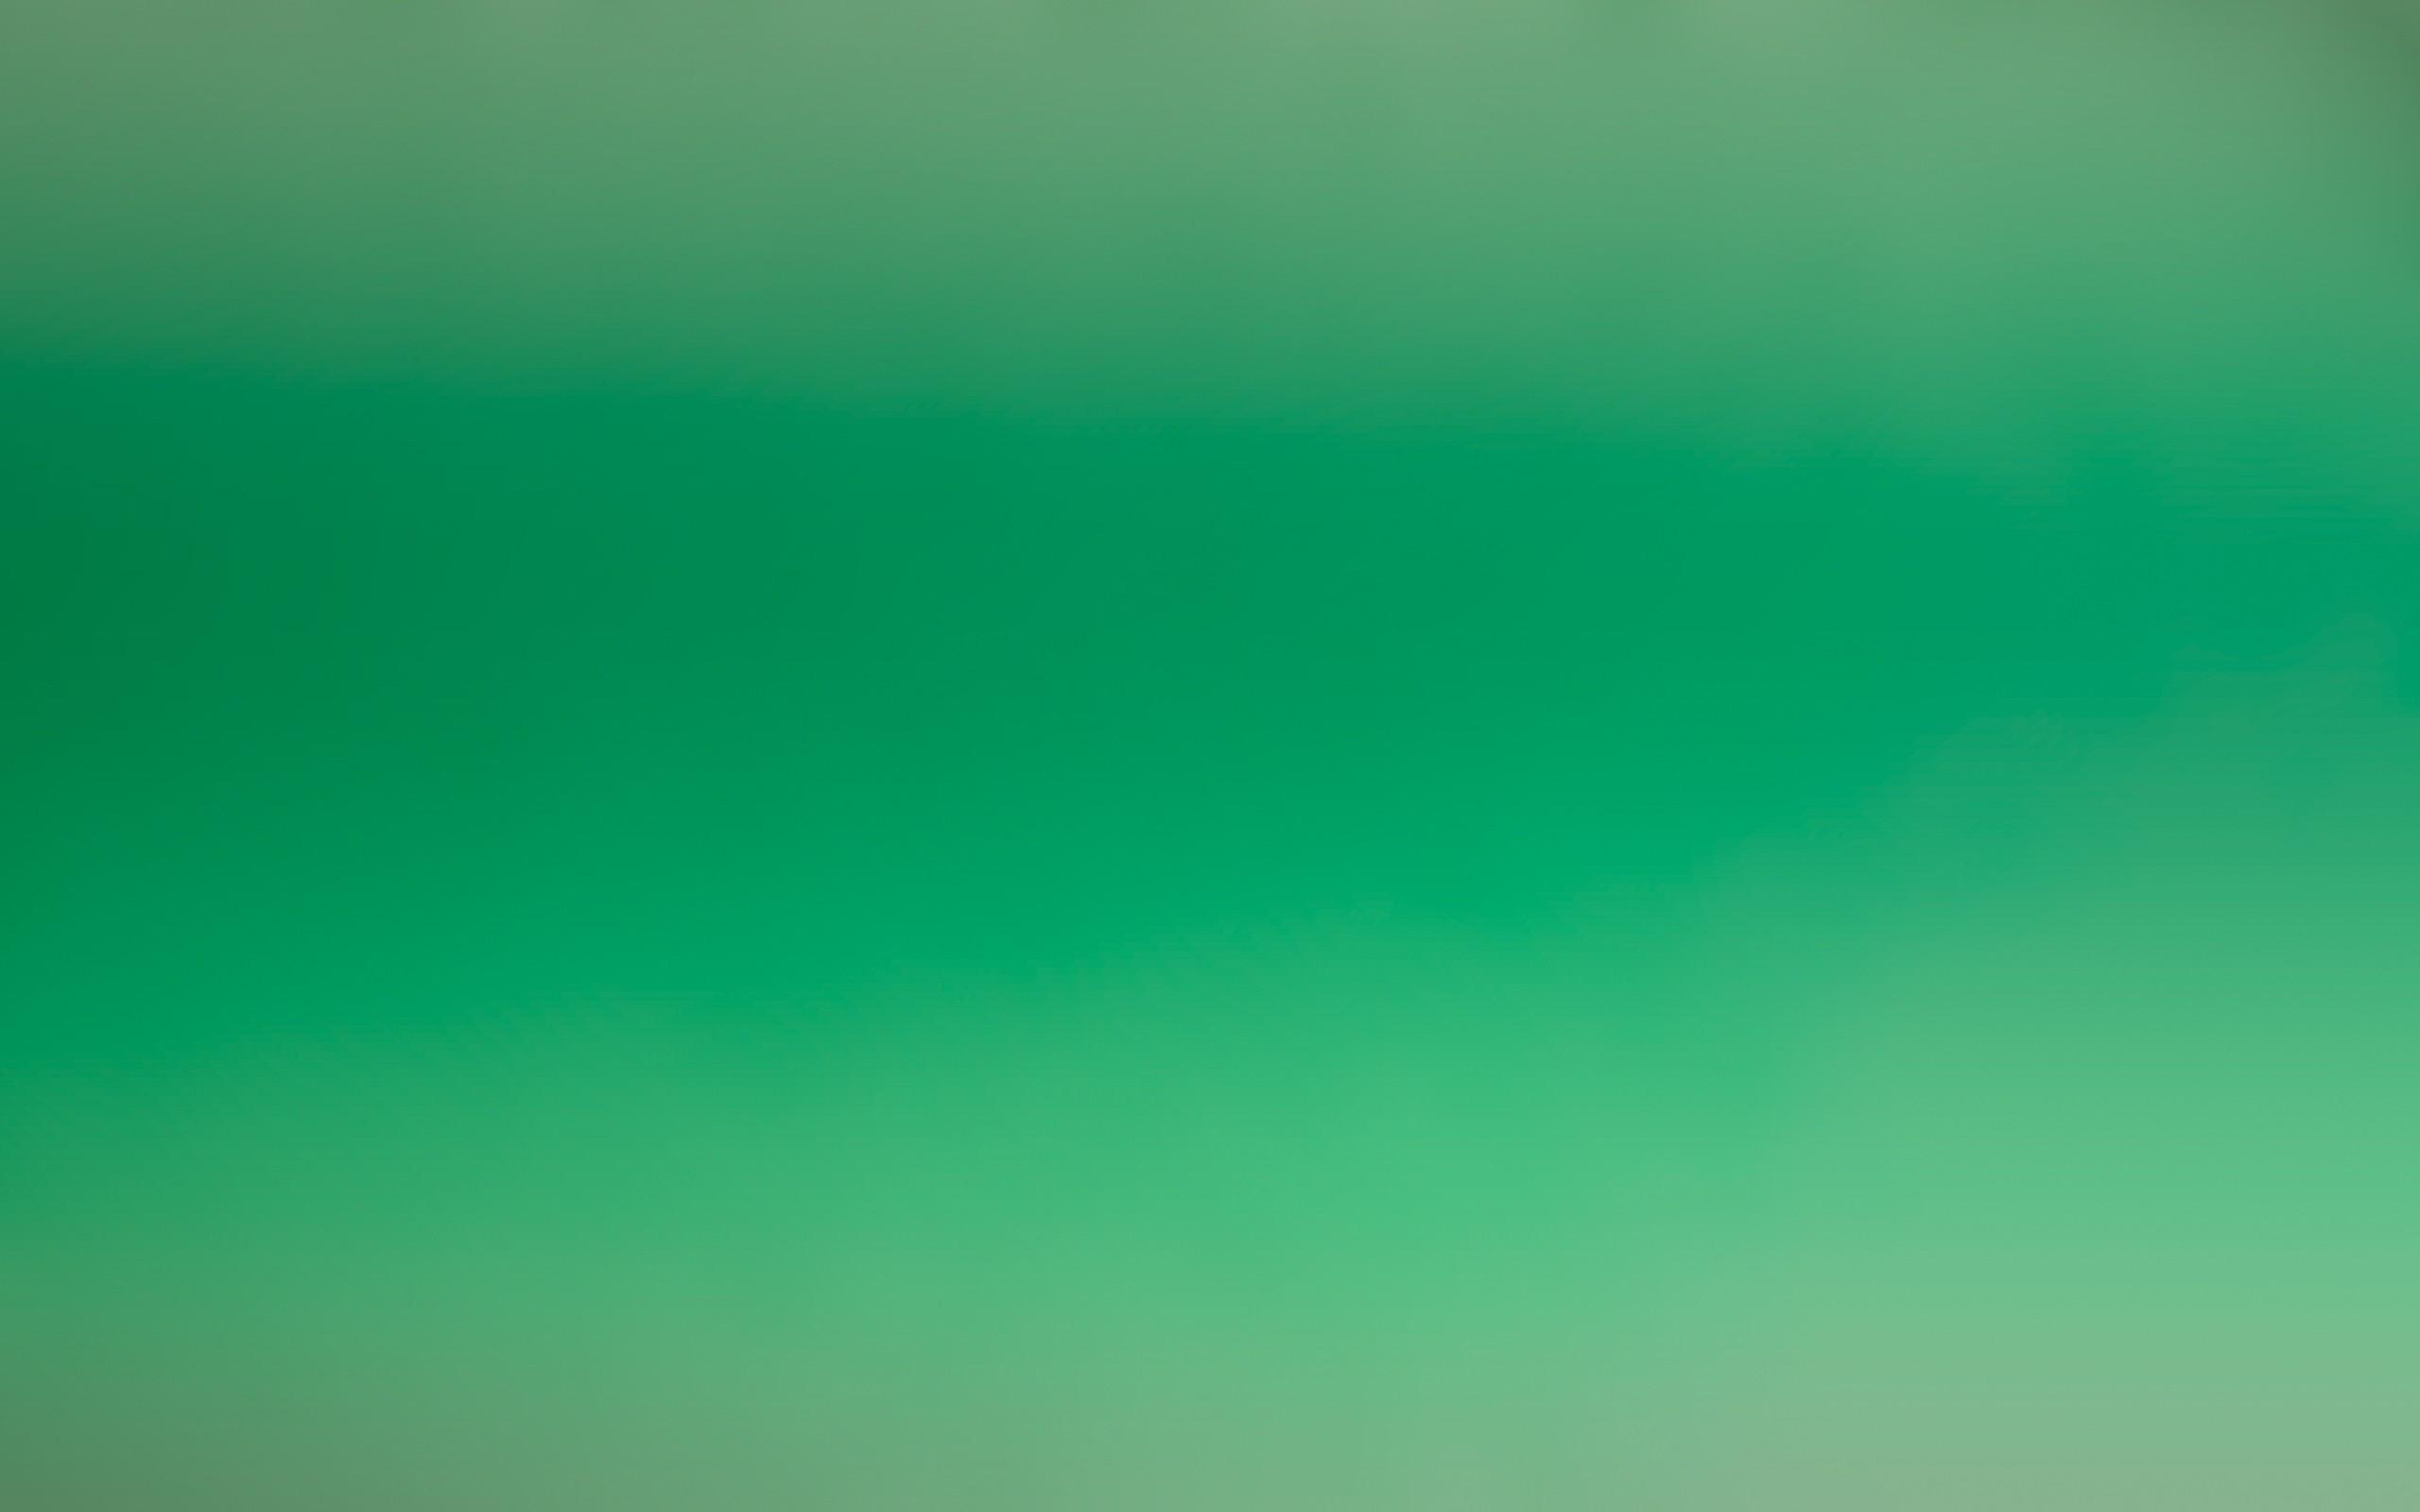 Fondo color verde - 2560x1600